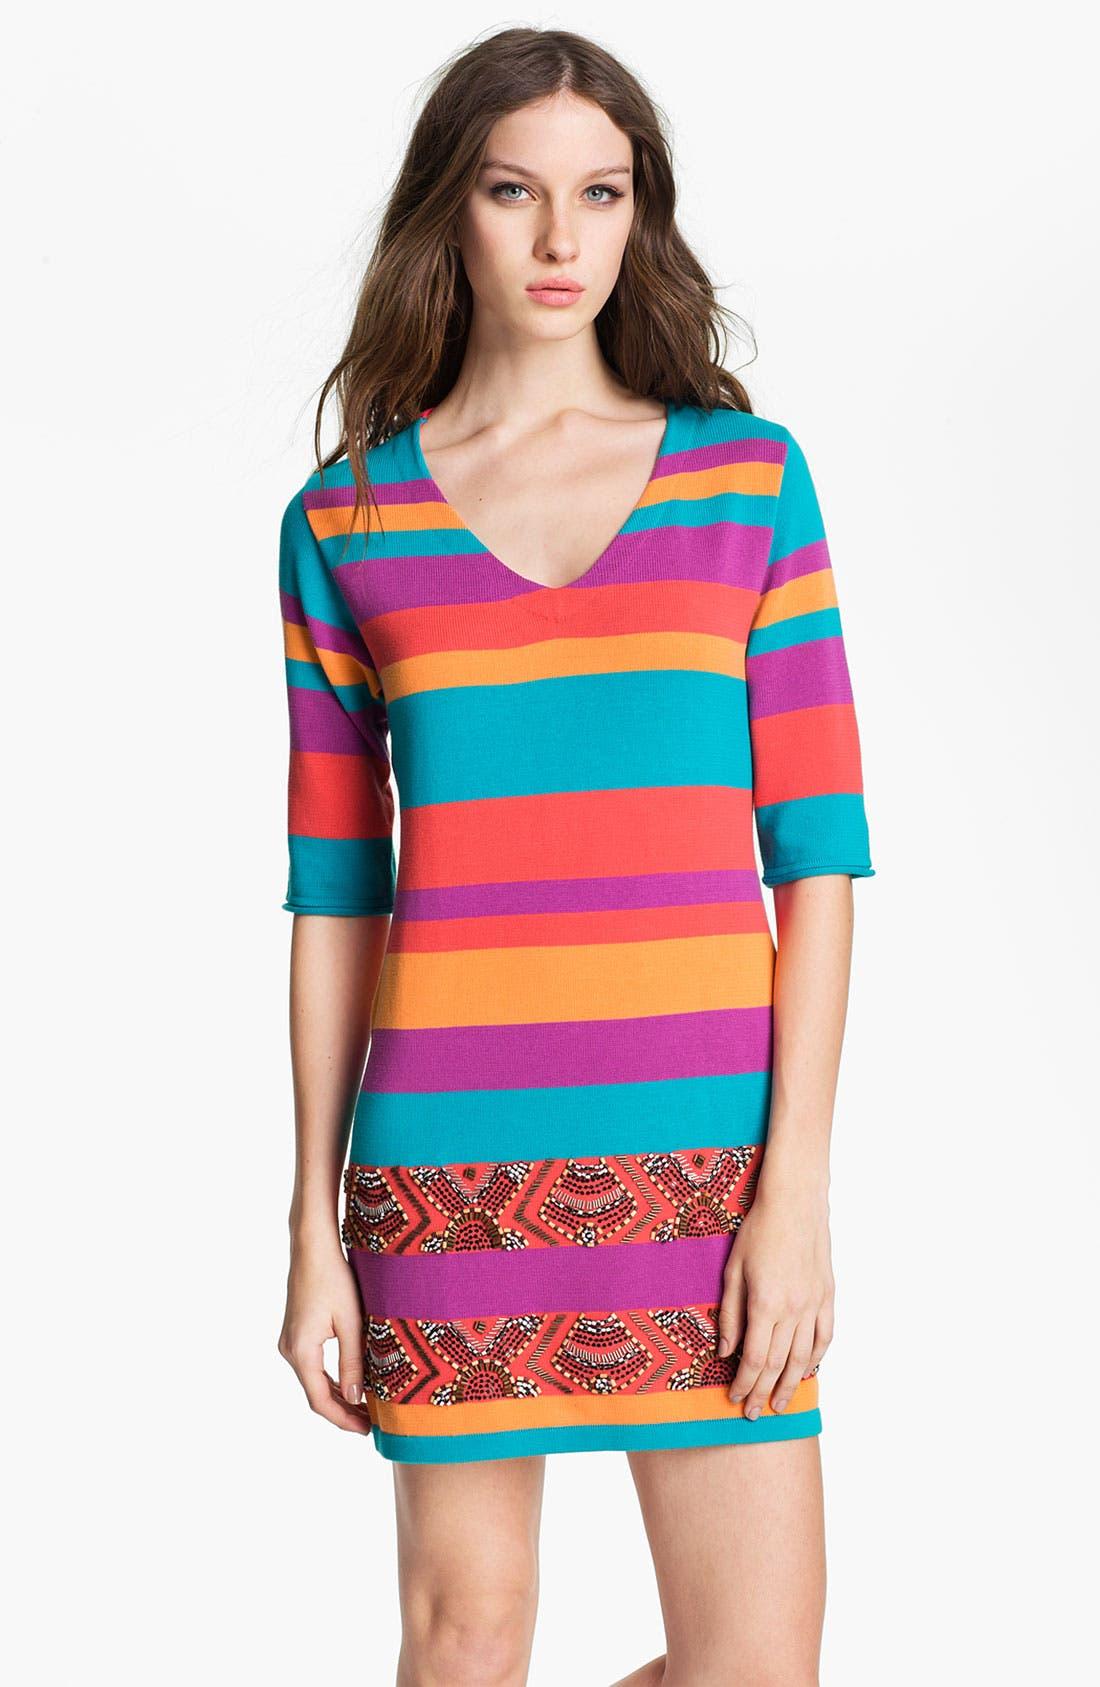 Alternate Image 1 Selected - Nanette Lepore 'Wah Wah' Cotton Sweater Dress